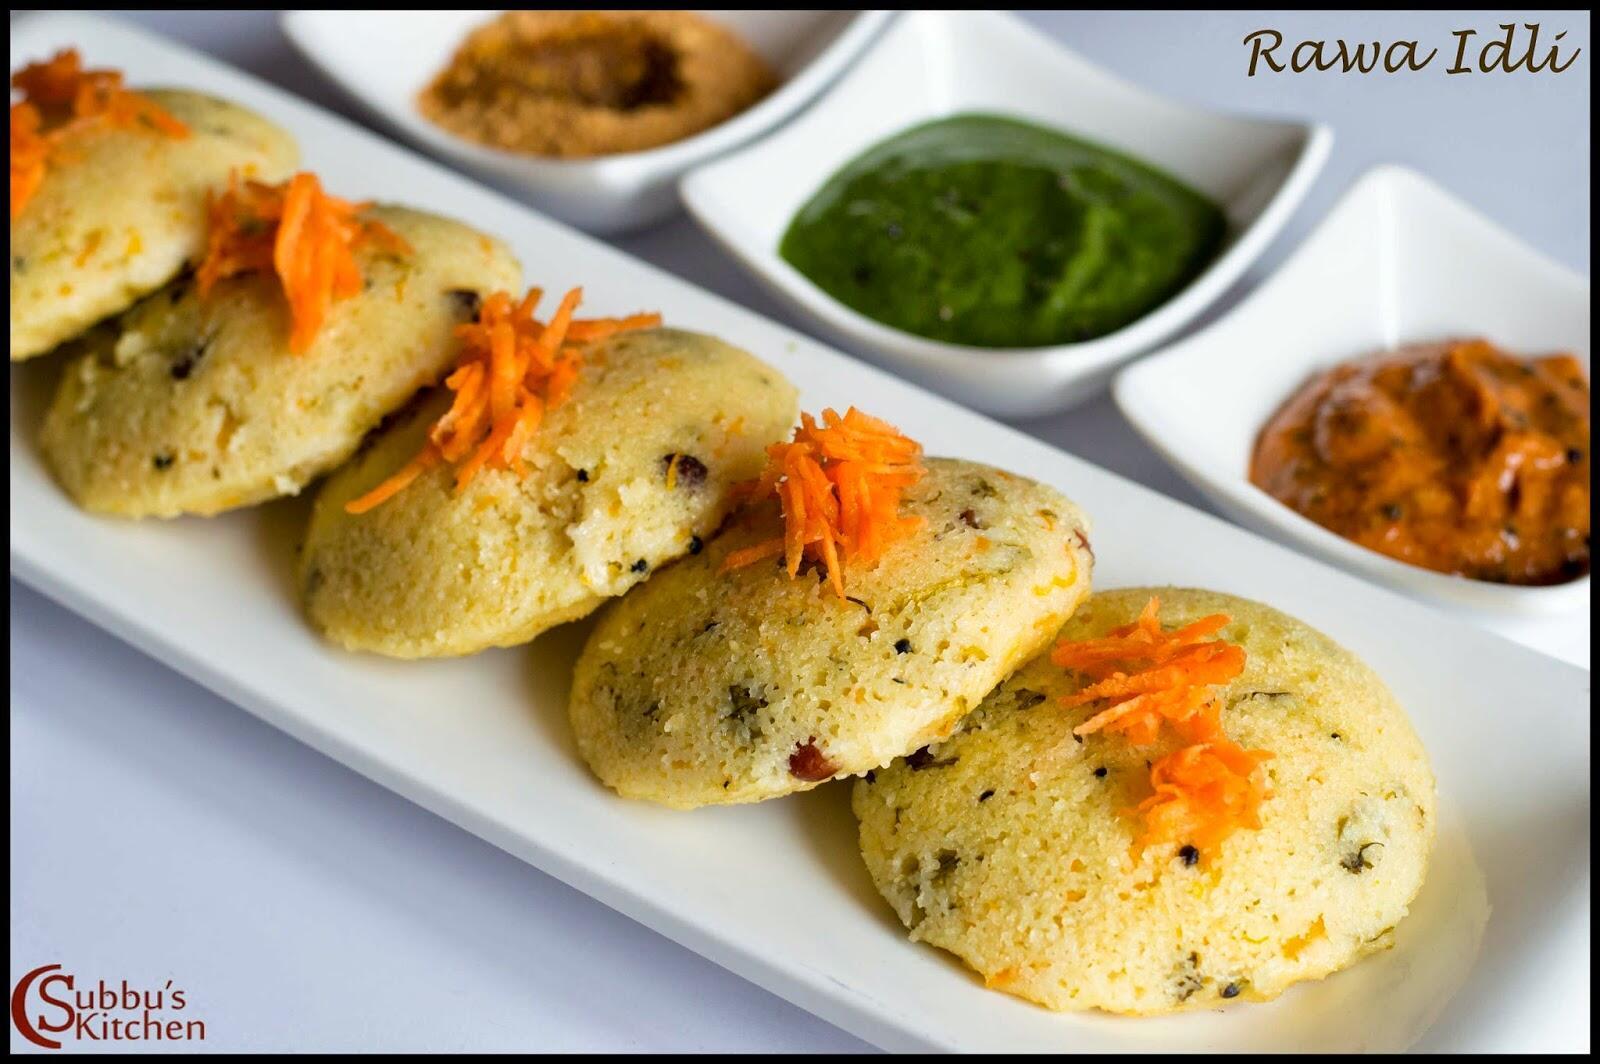 Rava Idli (Rawa Idly)| Instant Rava Idli Recipe